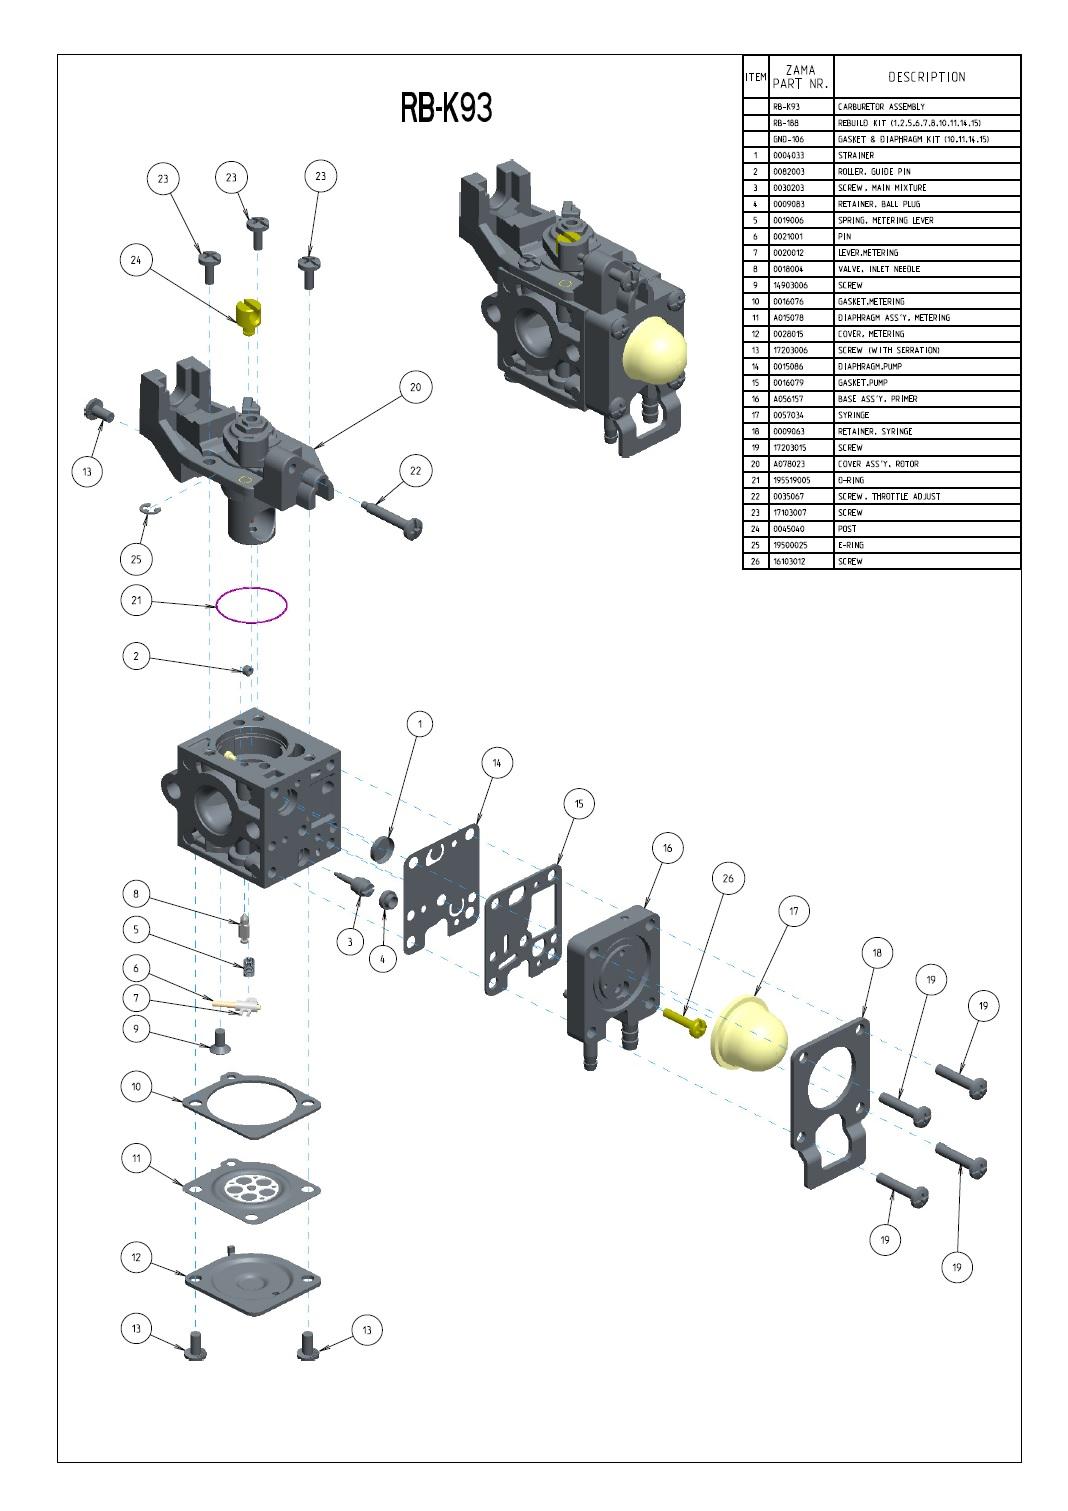 5e0062bd-87a7-44d4-910c-d3cb19dbae9e_RB-K93.jpg